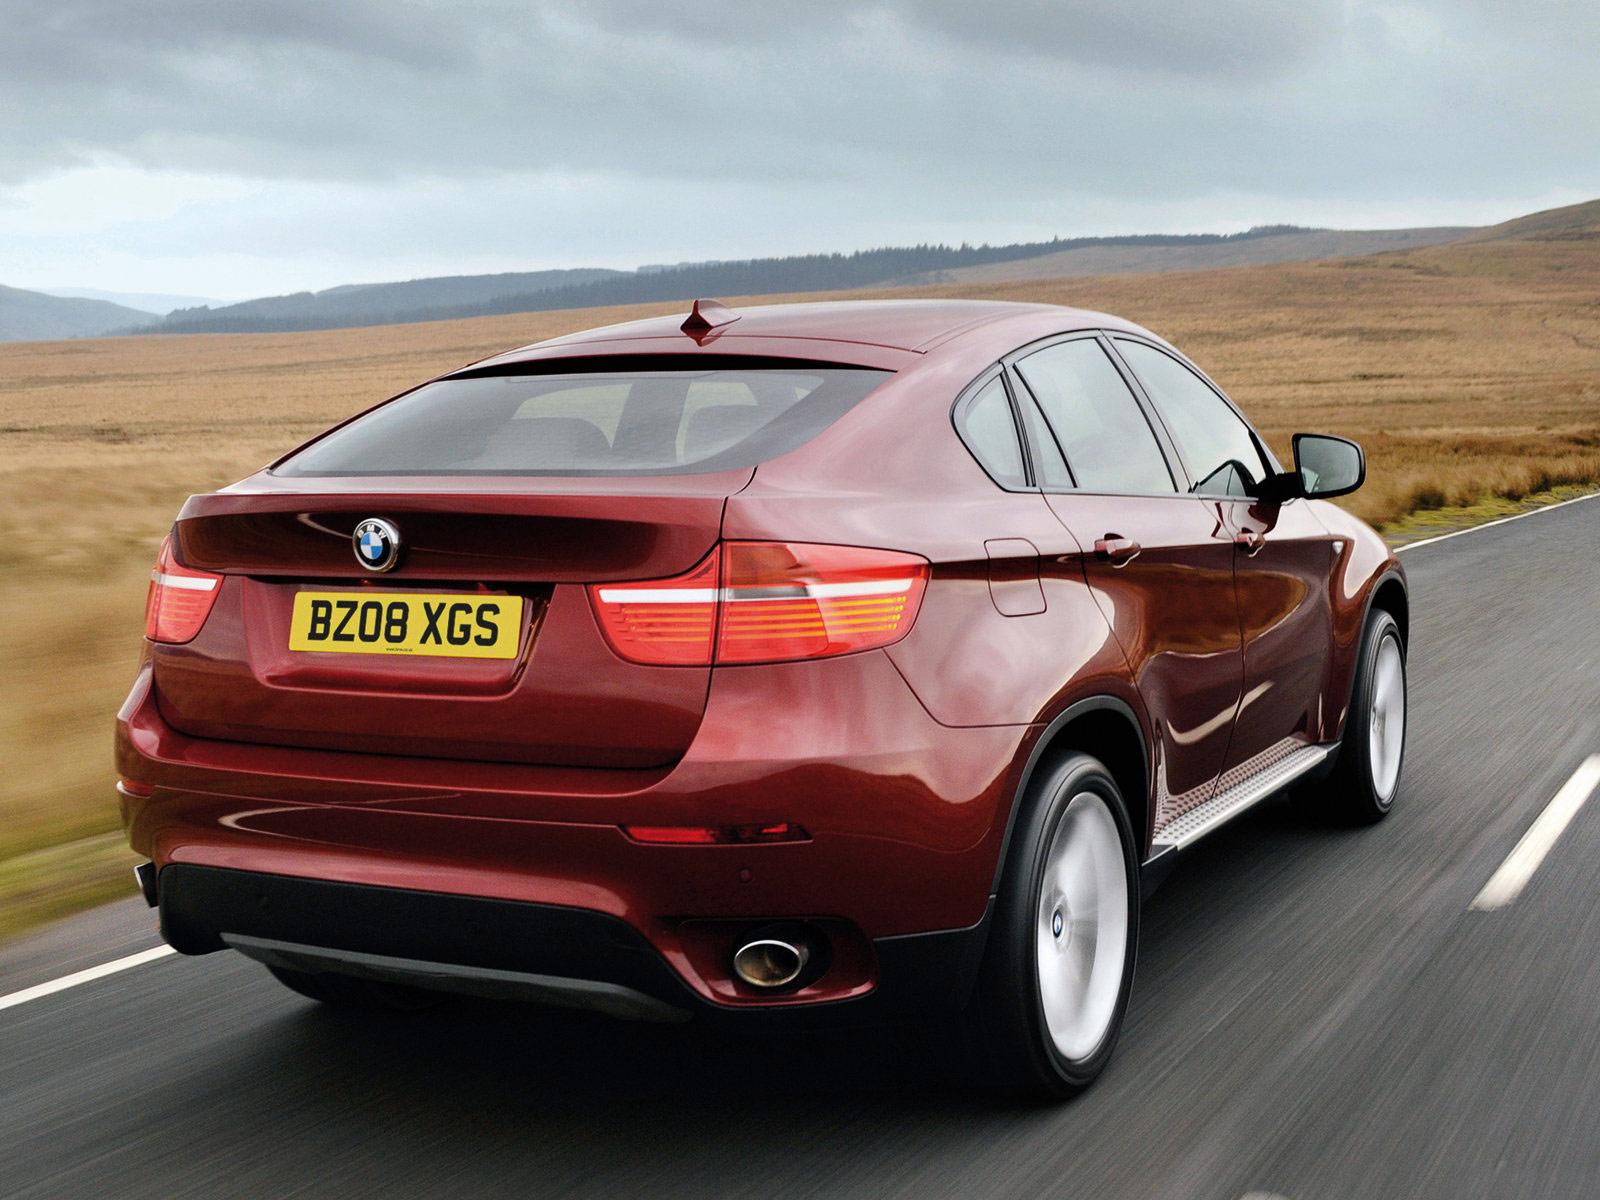 Car insurance. 2009 BMW X6 UK Version. Desktop Wallpaper.